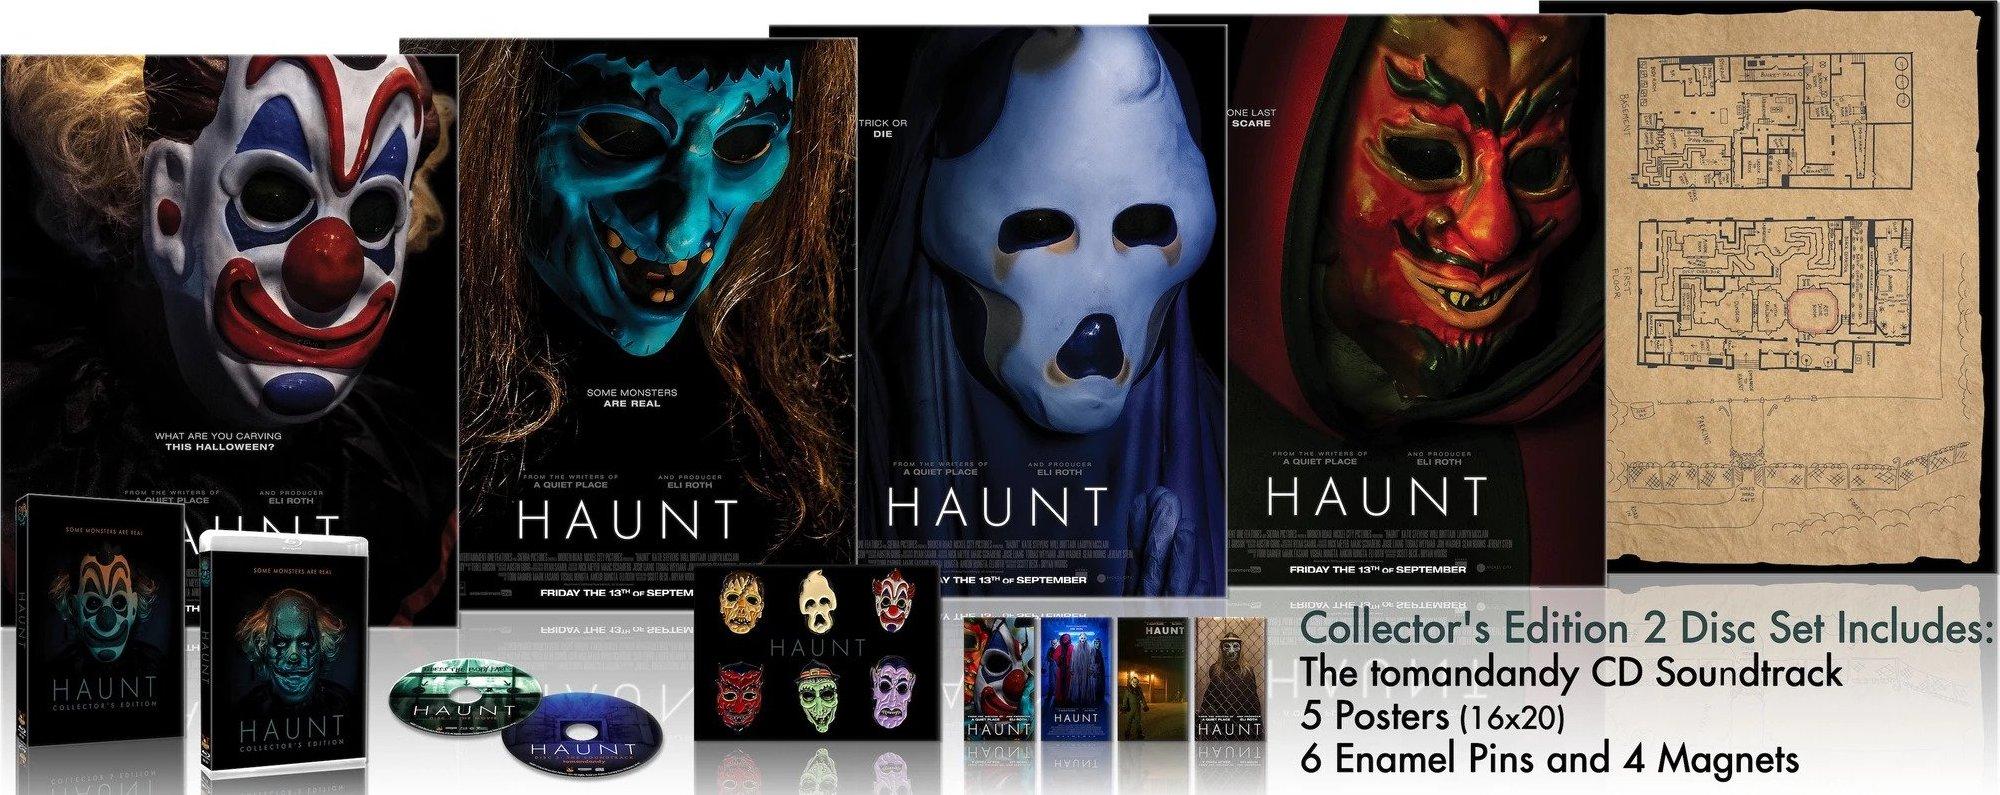 Haunt (Blu-ray)